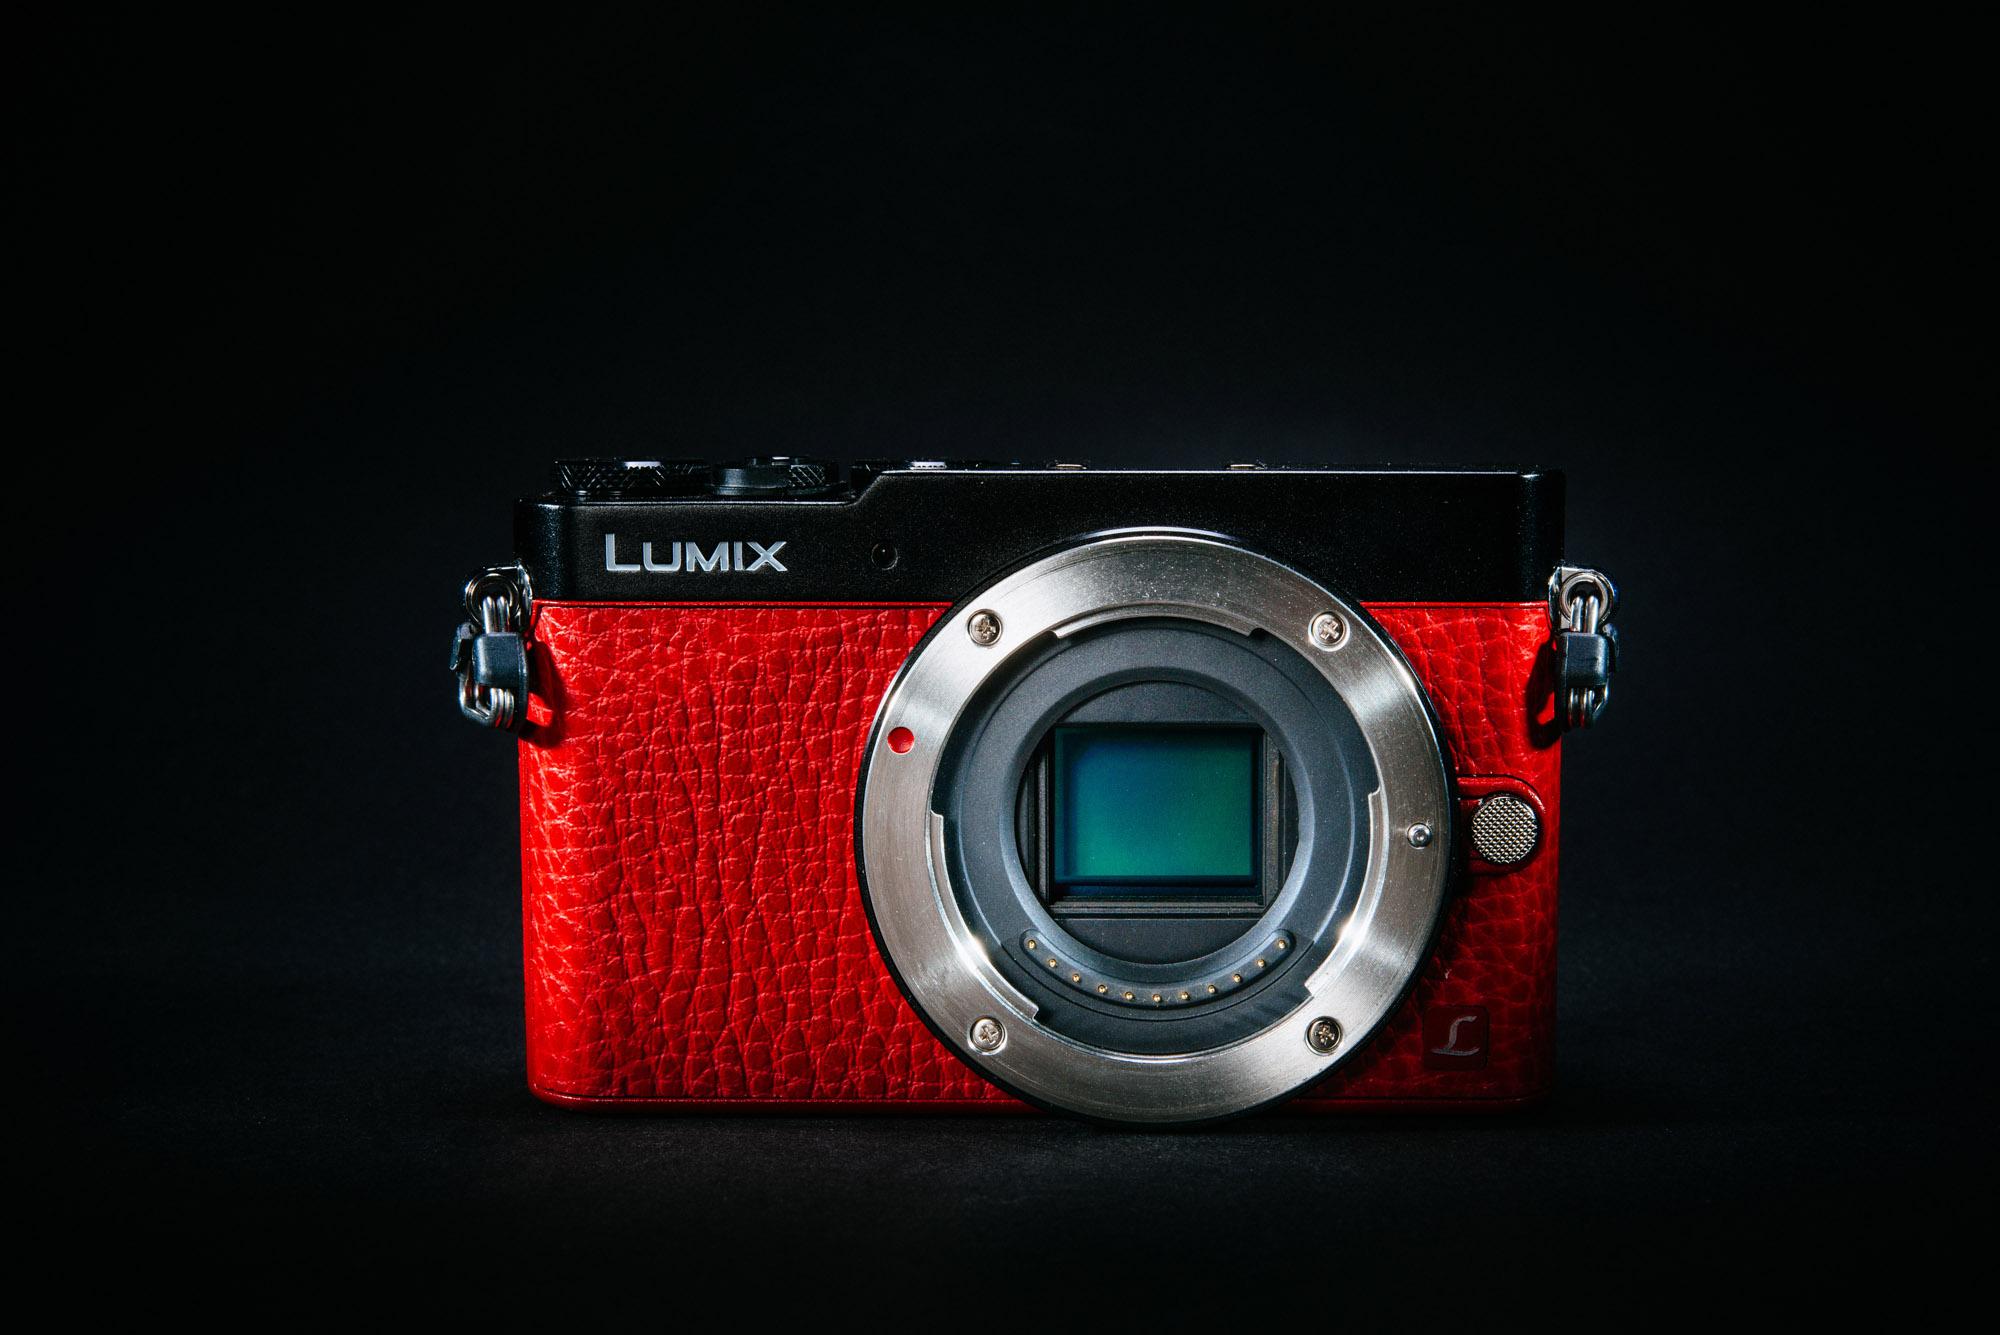 panasonic_lumix_gm5_review_03